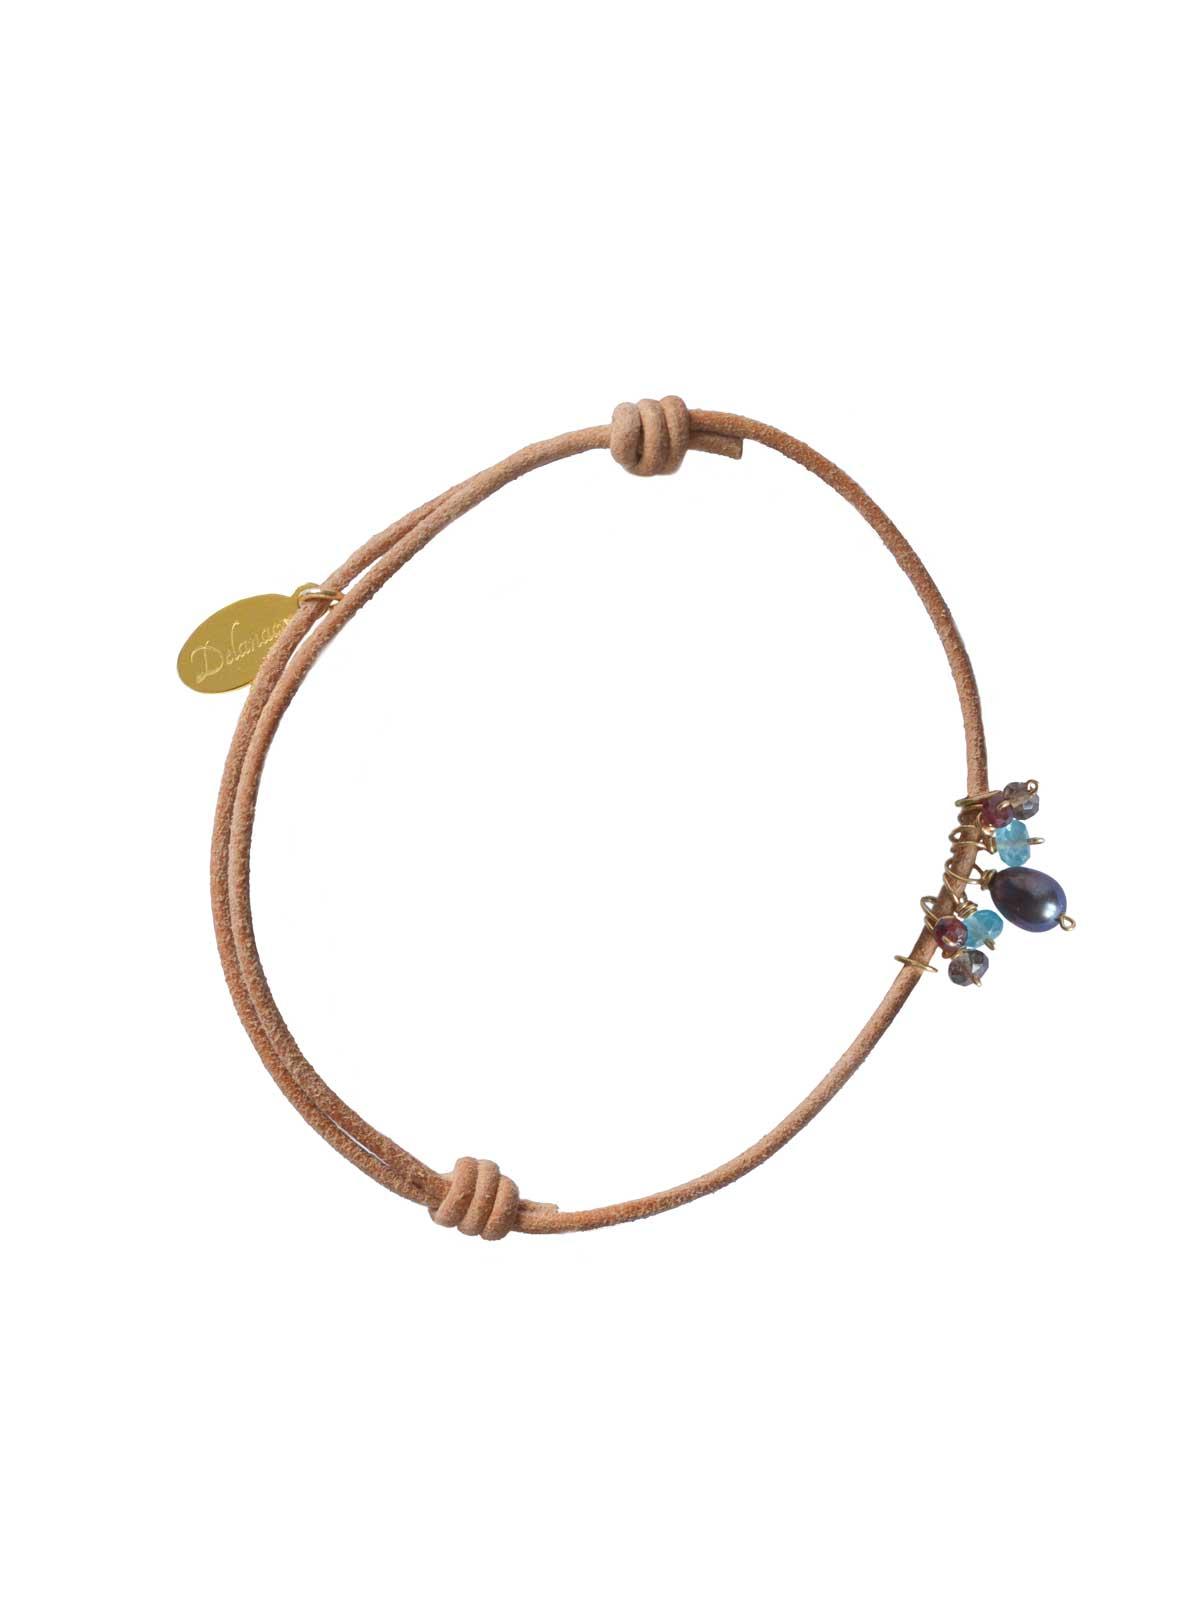 Bracelet Smoky Quartz Apatite Garnet gray Freshwater Pearl Gold natural leather link